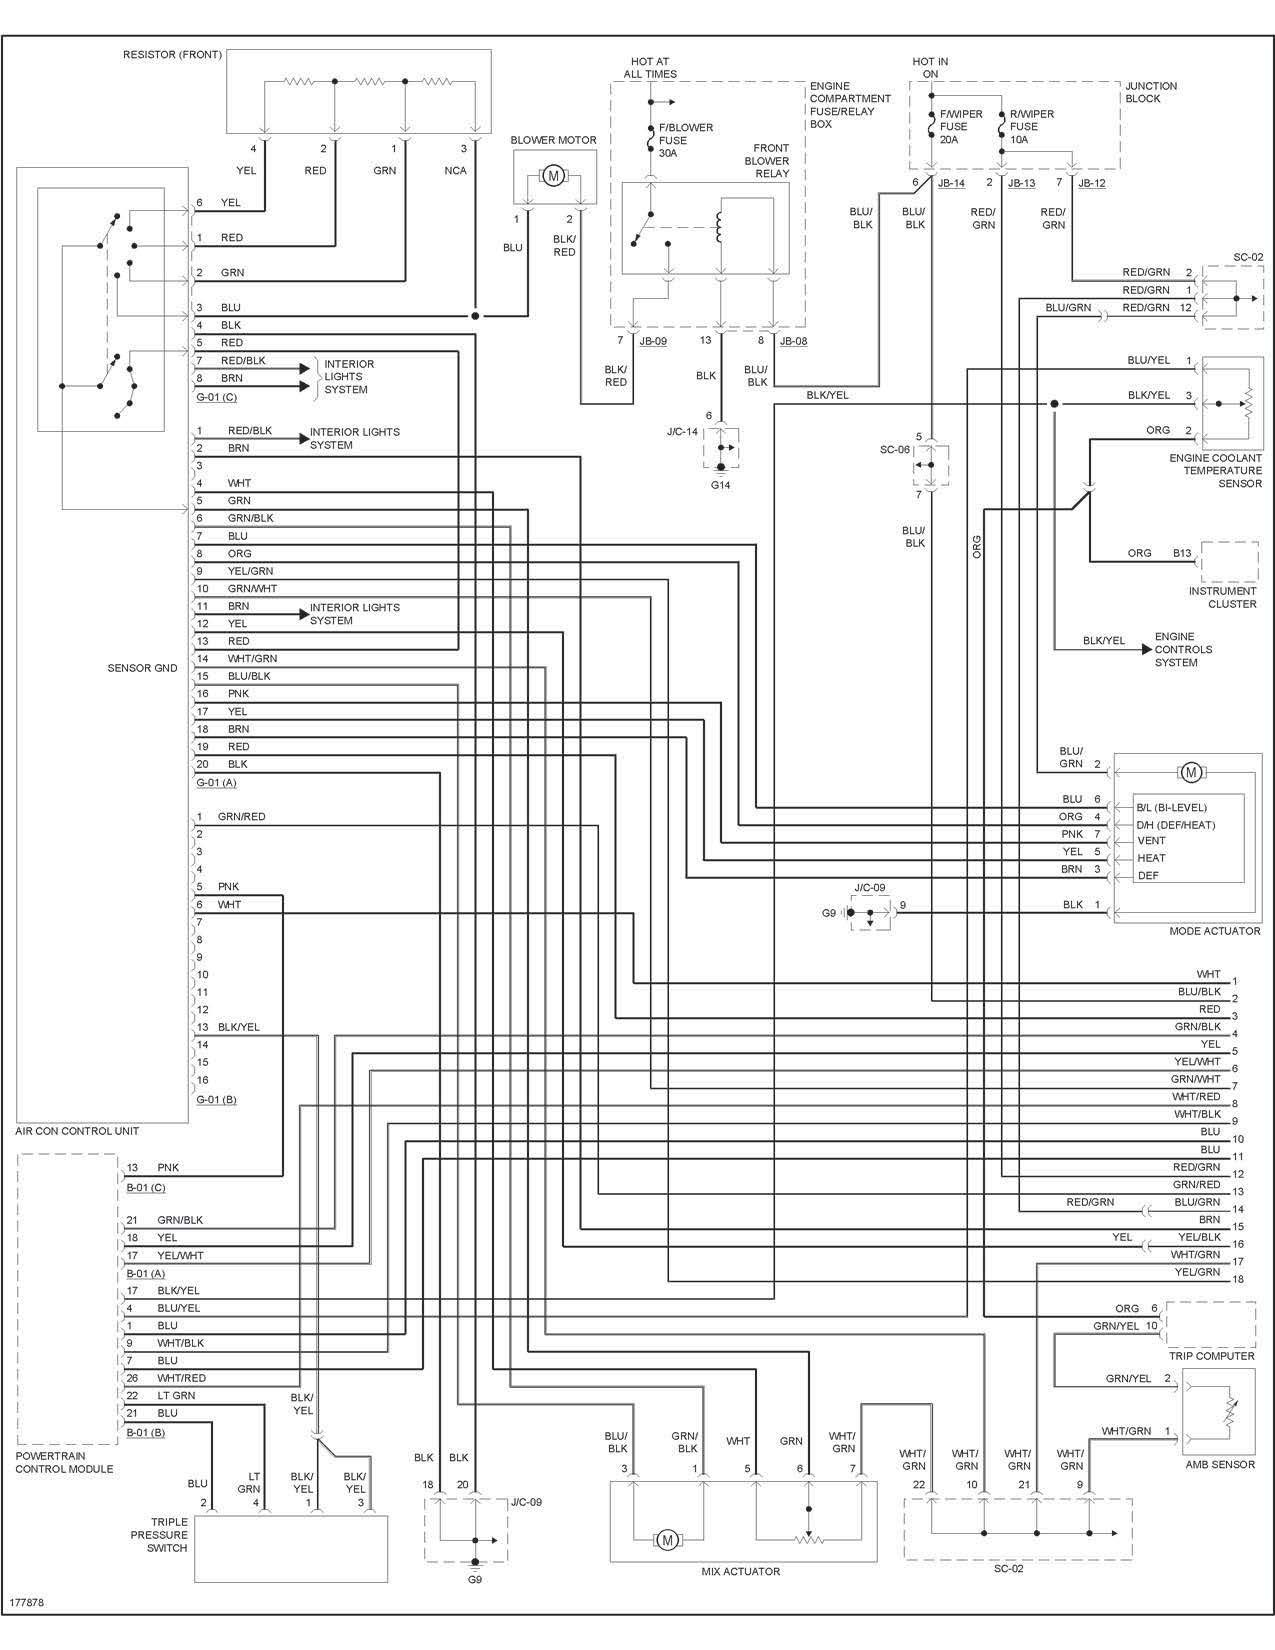 Cool Wrg 9165 2003 Kia Rio Wiring Harness Diagram Wiring Cloud Itislusmarecoveryedborg